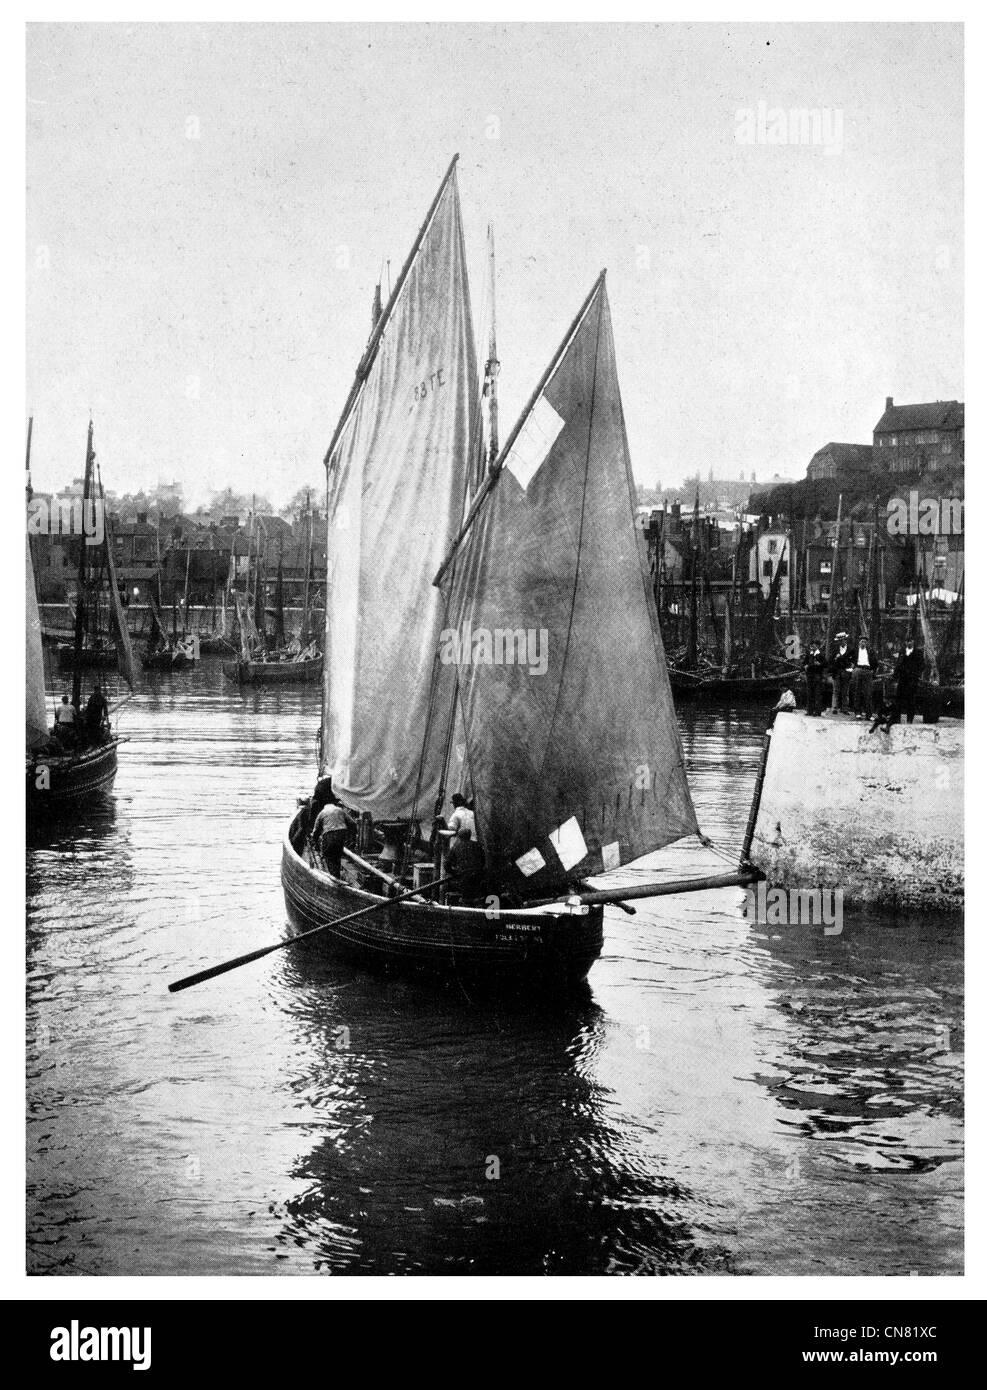 Schooner sailing sail Edwardian era 1900 - Stock Image